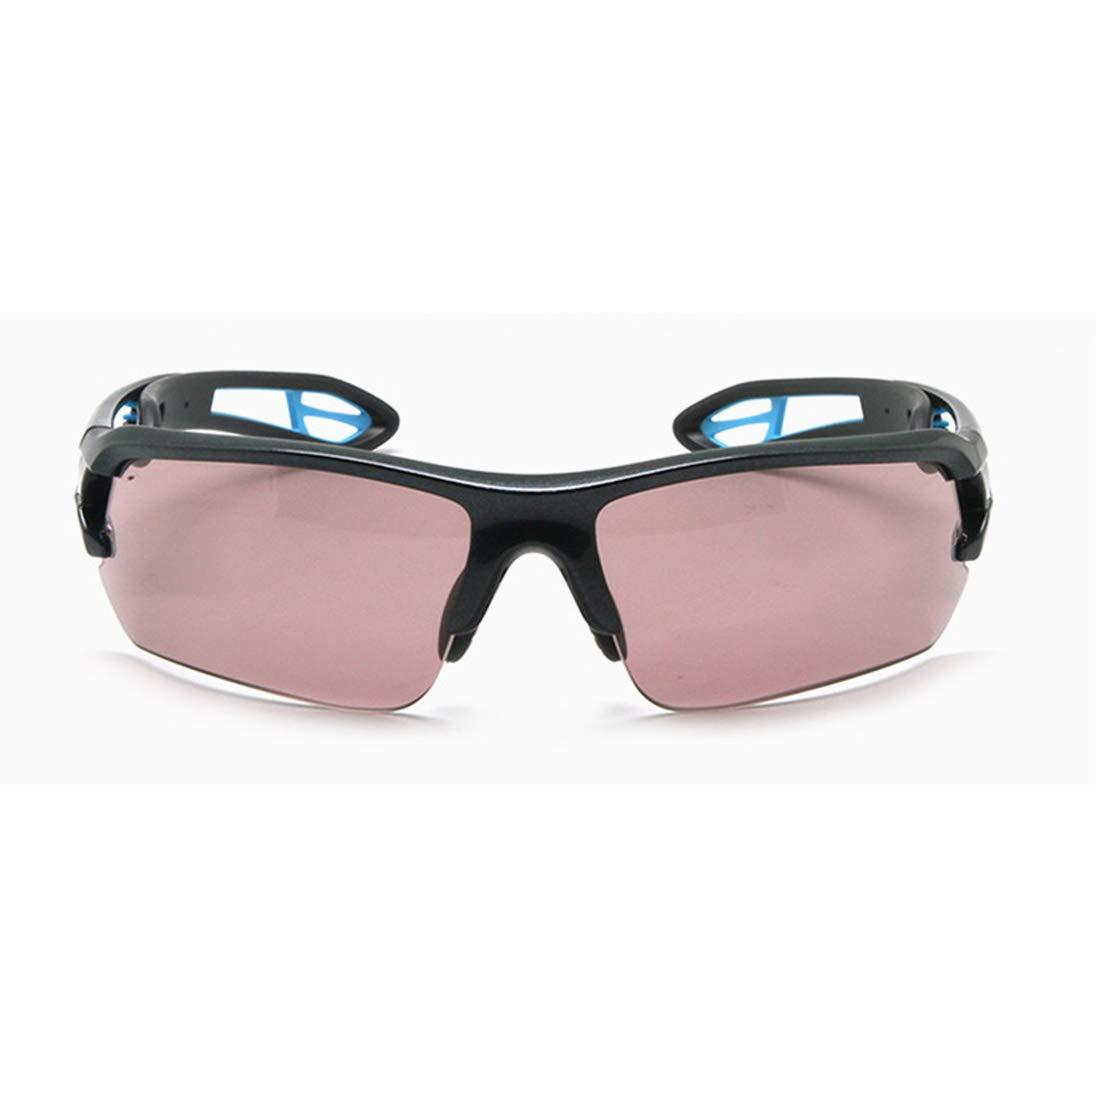 CAFUTY サイクリング用メガネ自転車の色を変えるロードメガネ屋外用サイクリングの恋人に適した屋外用メガネ。 (Color : A001)  A001 B07N8VK3C2